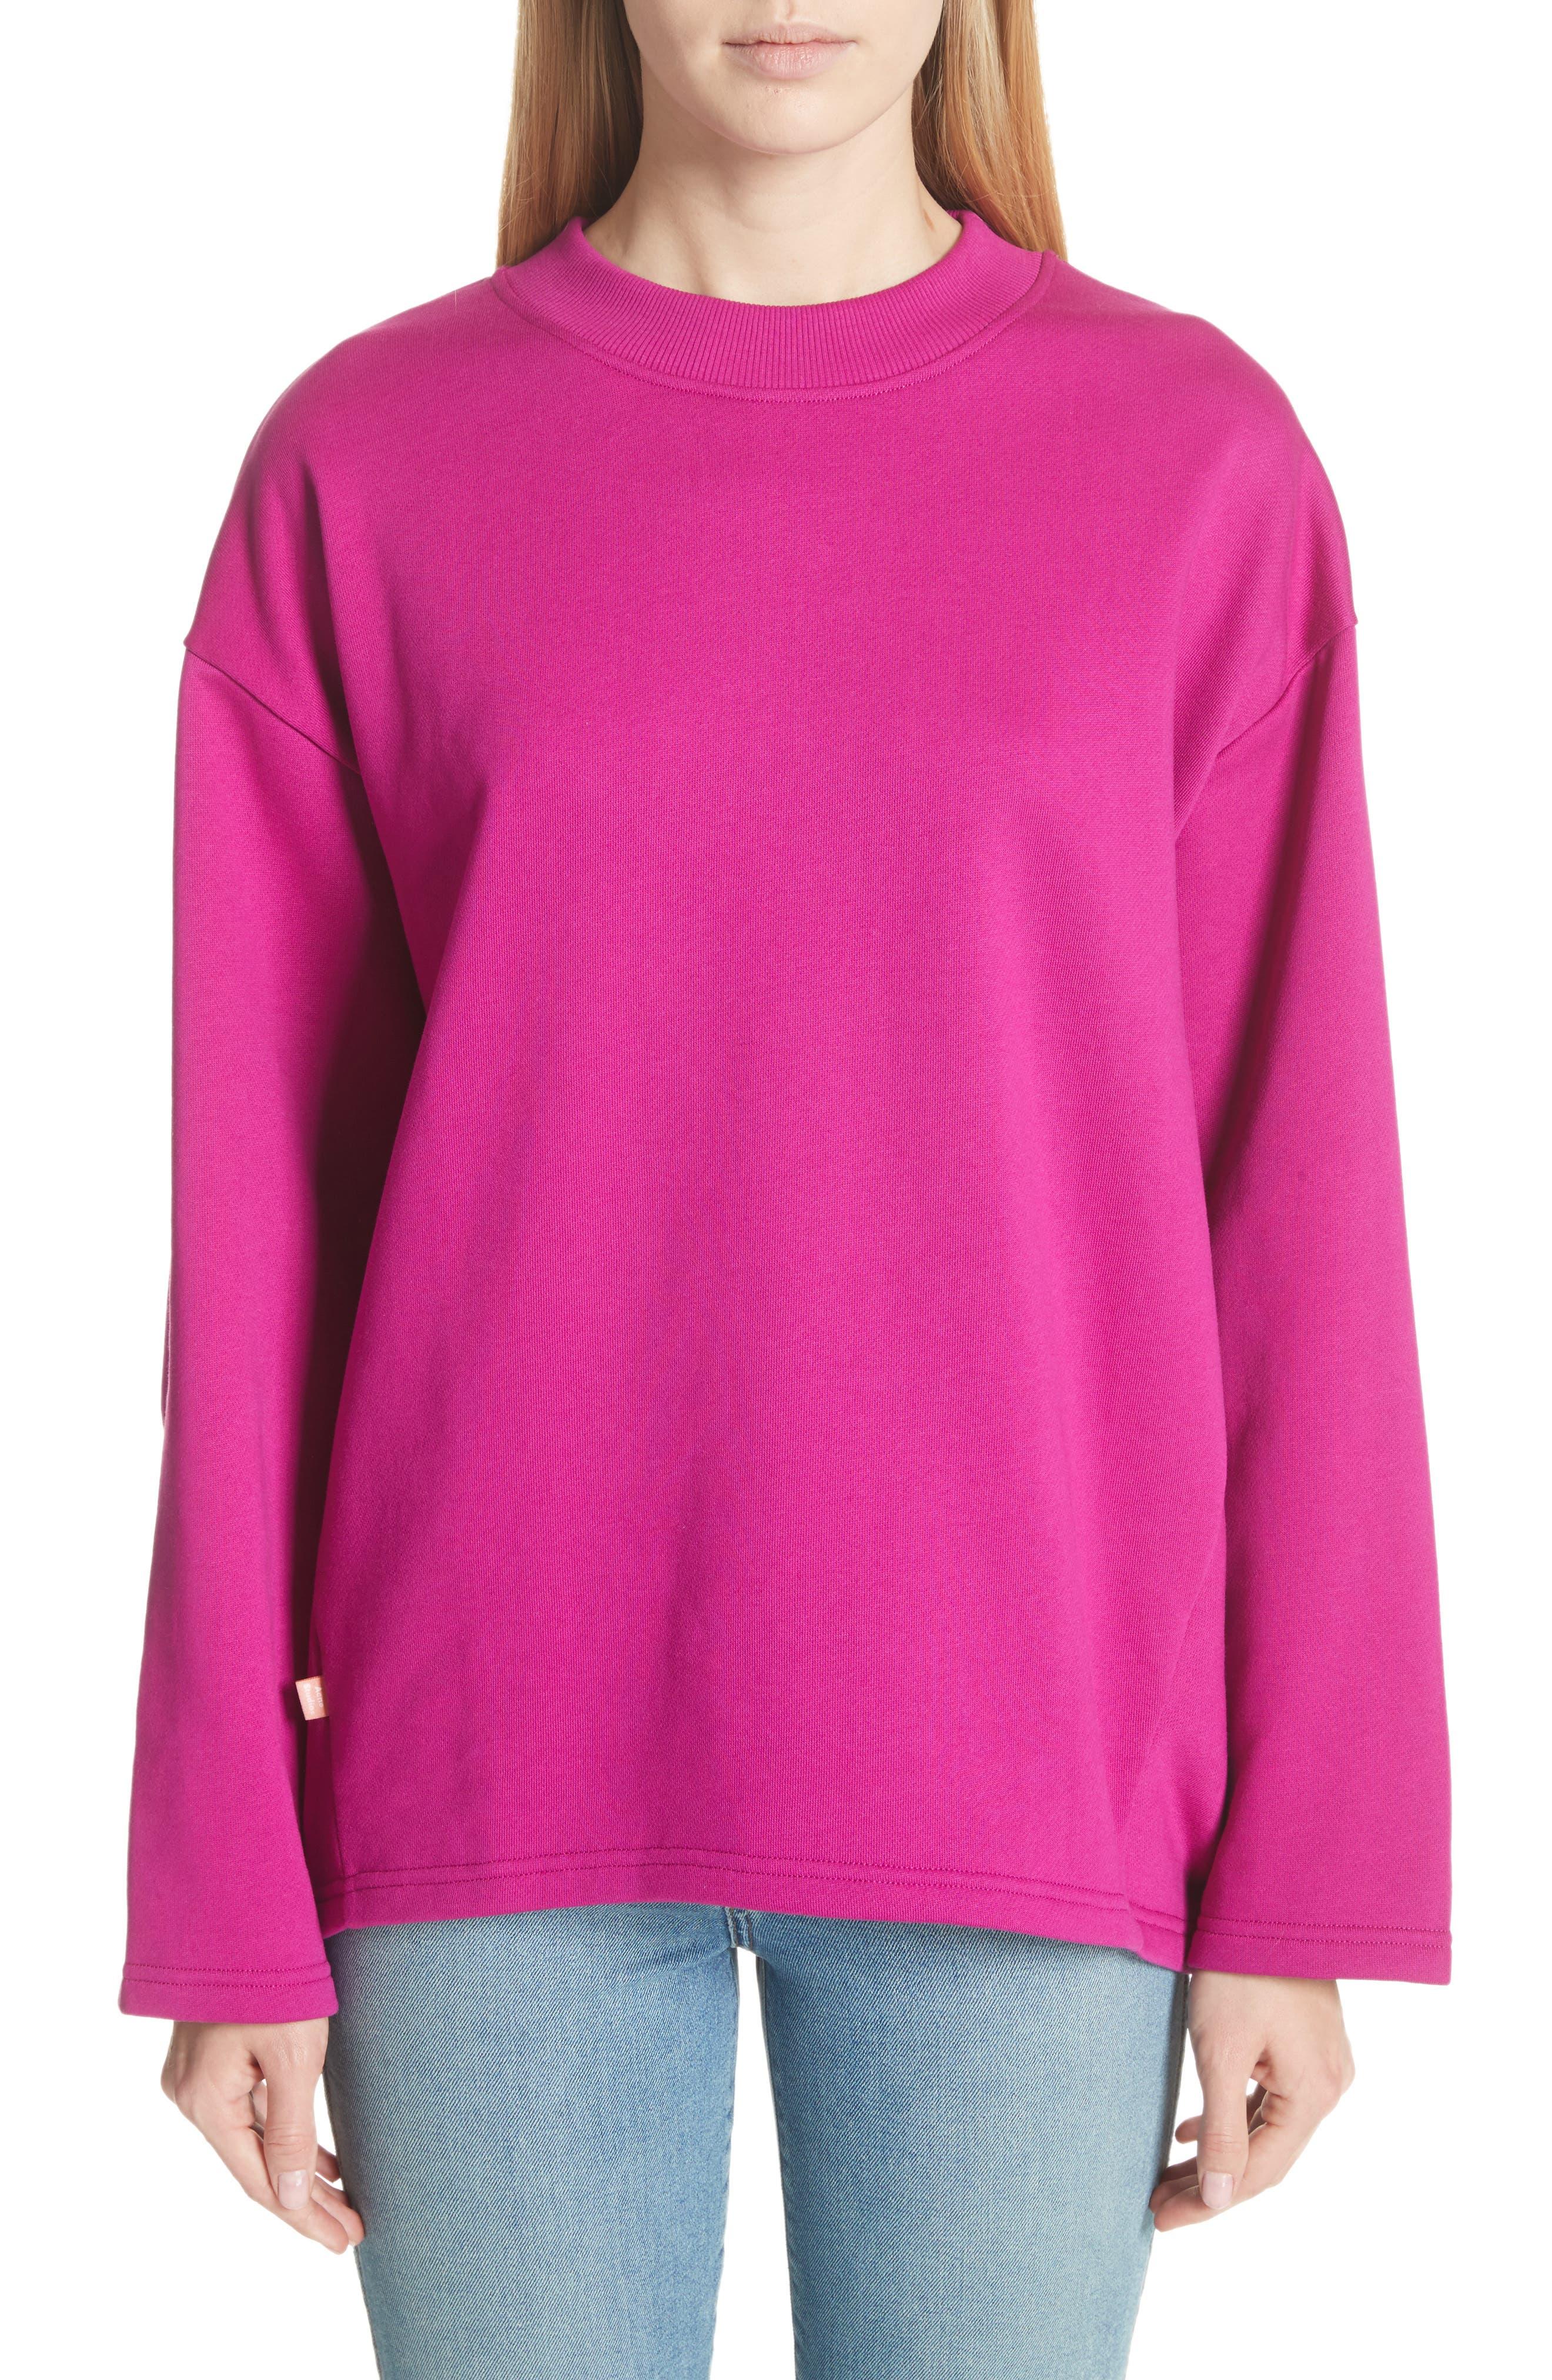 Karvell Sweatshirt,                         Main,                         color, 500